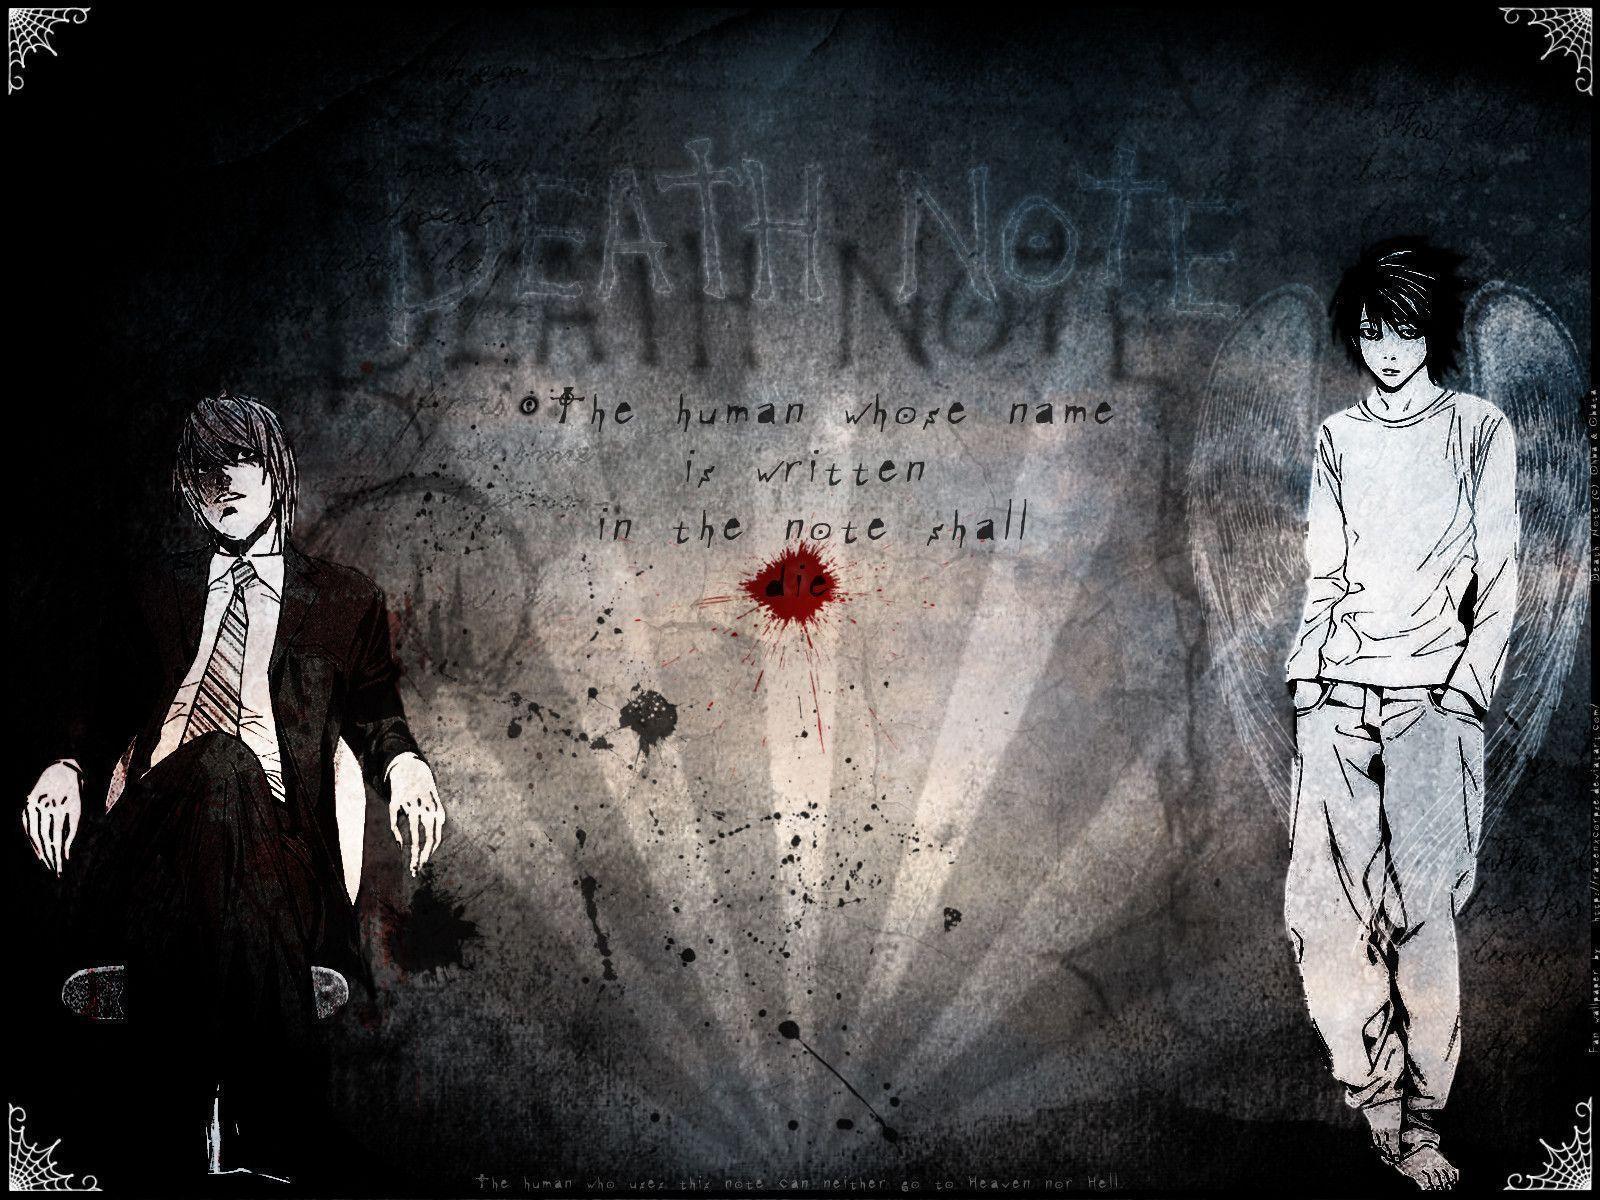 death note 1024x768 wallpaper - photo #5